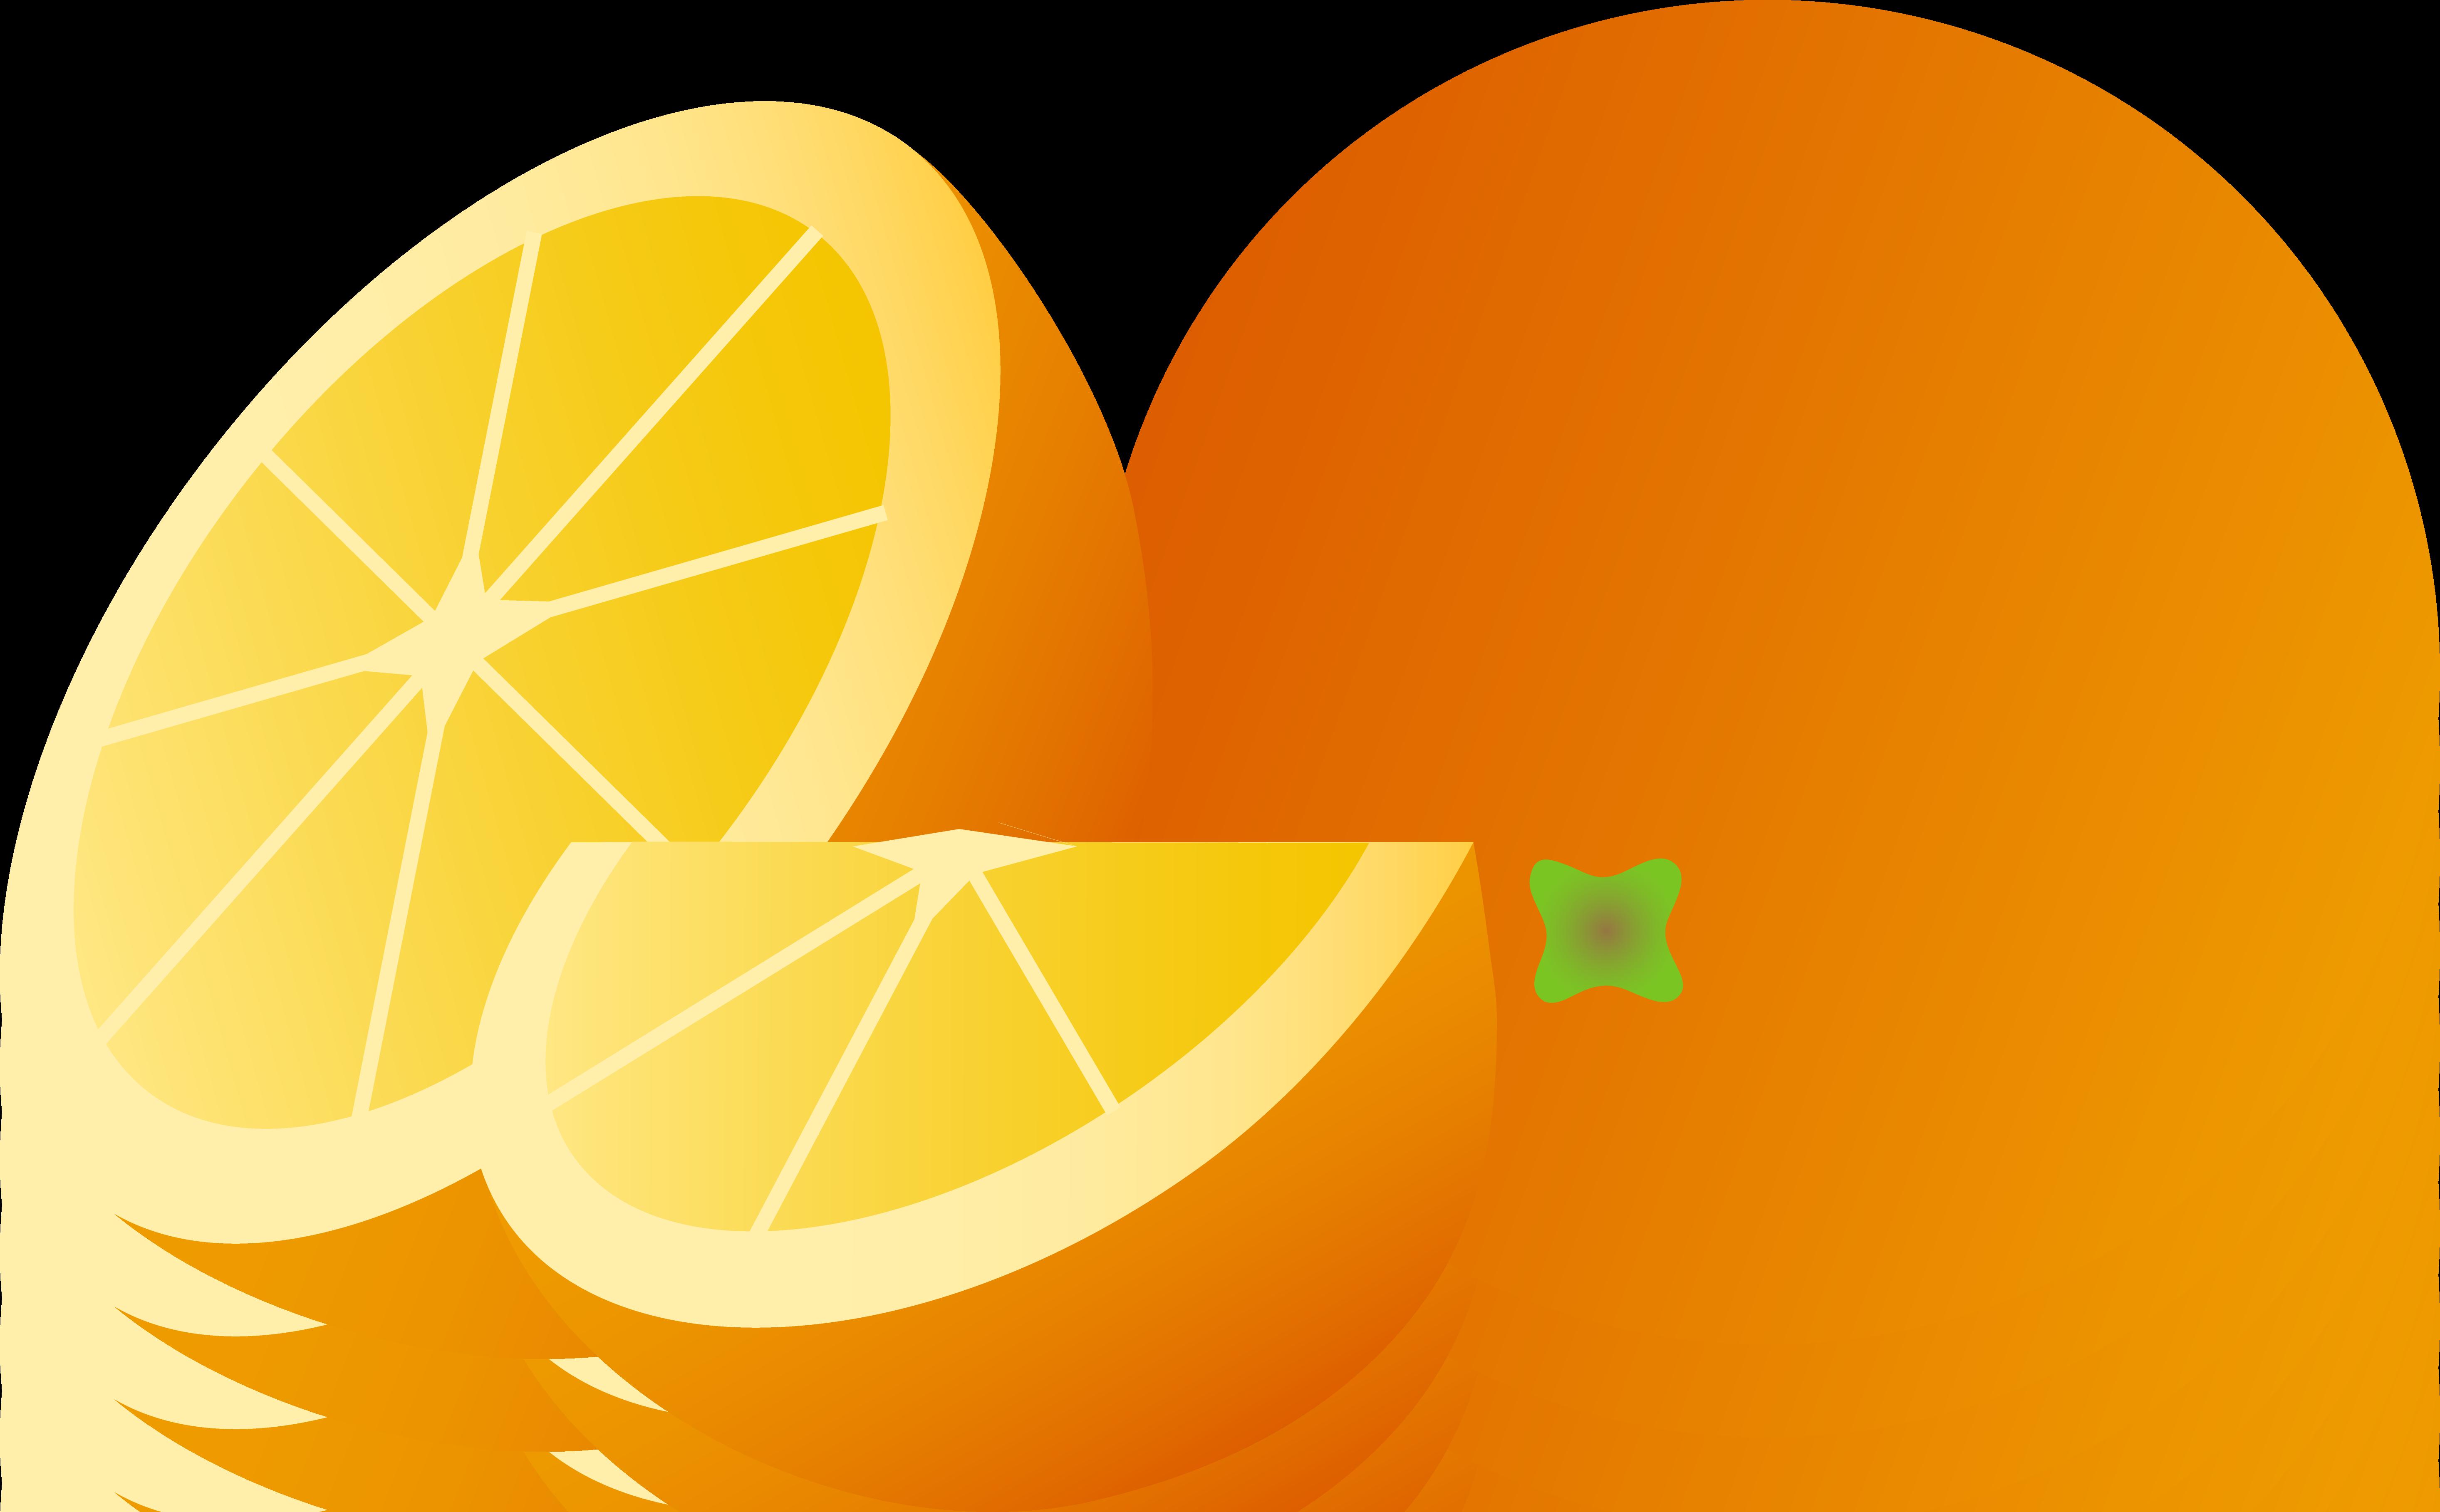 Simple Orange Fruit Clipart Free Clip Ar-Simple Orange Fruit Clipart Free Clip Art Images-18